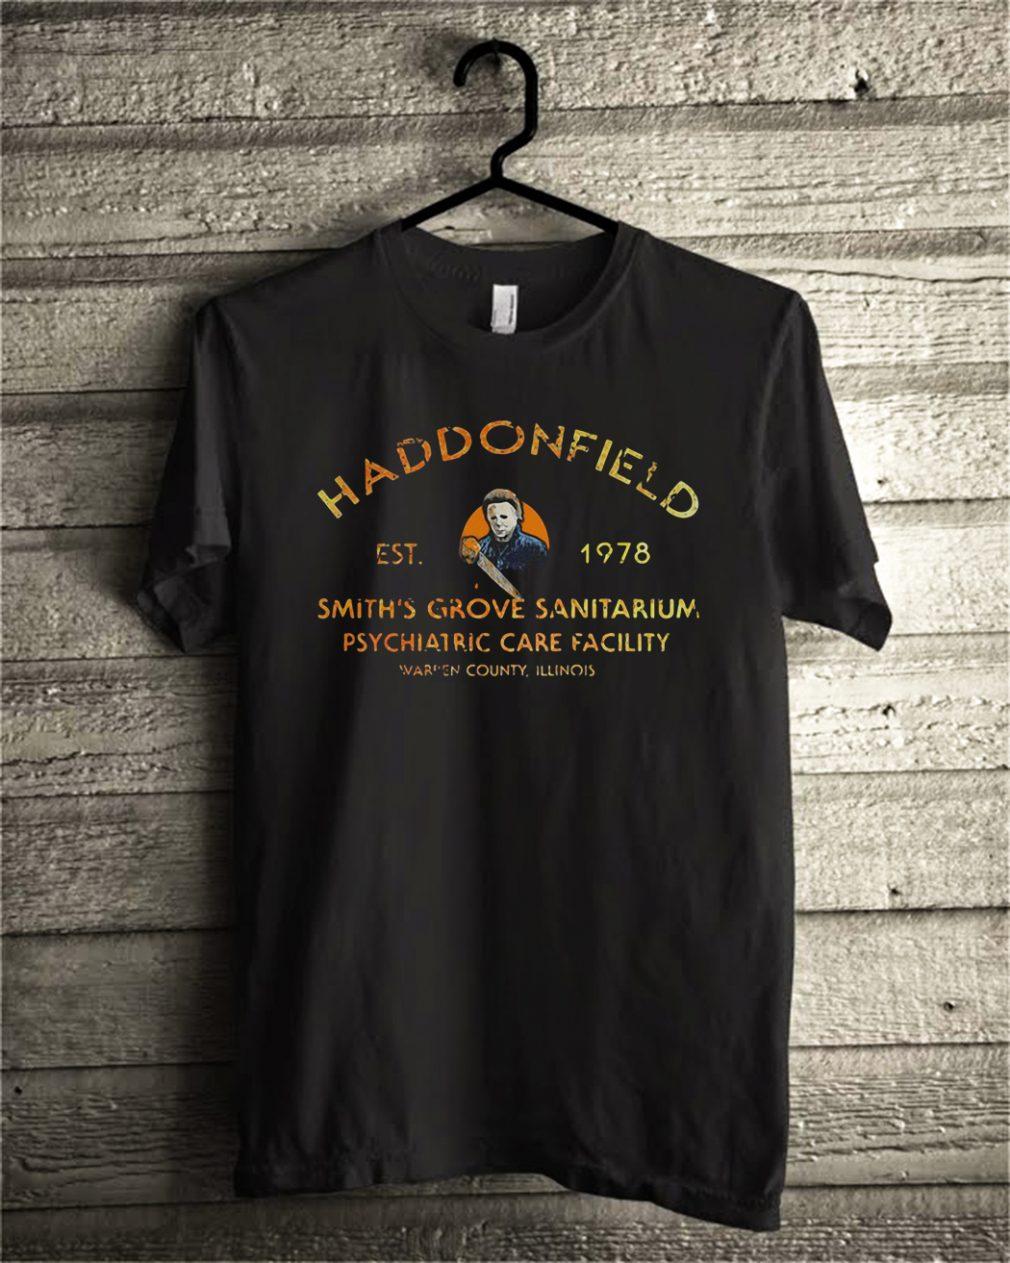 Haddonfield EST 1978 Smith's Grove Sanitarium shirt